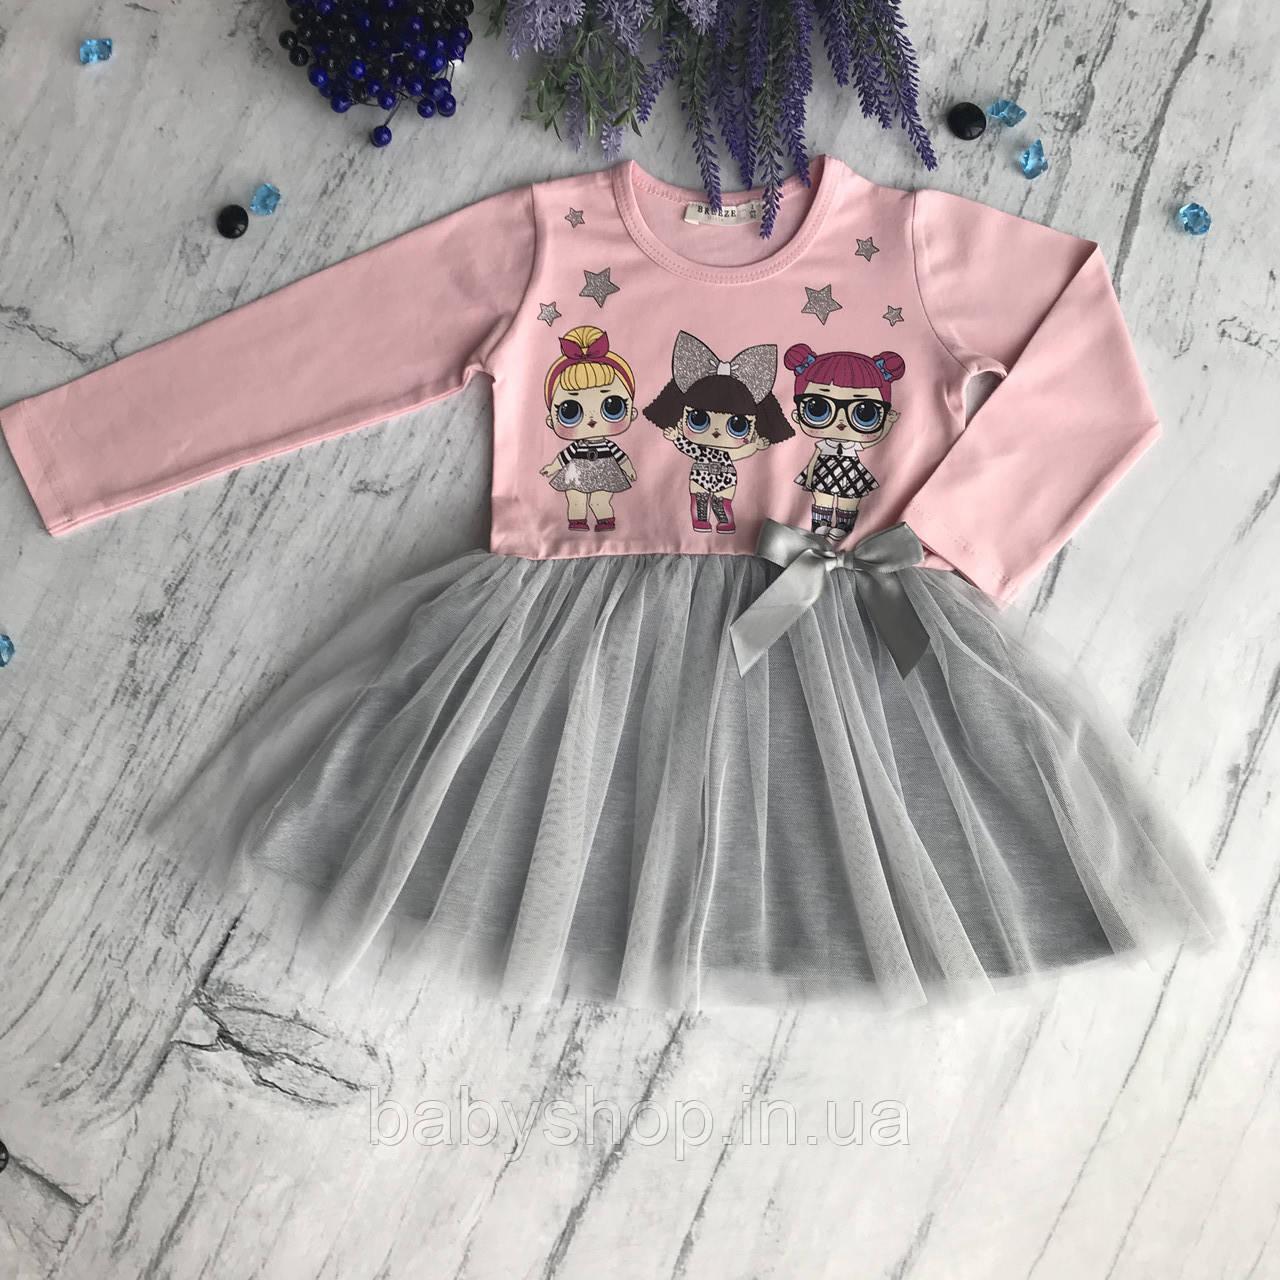 Платье Breeze Лол 5. Размеры 92, 104